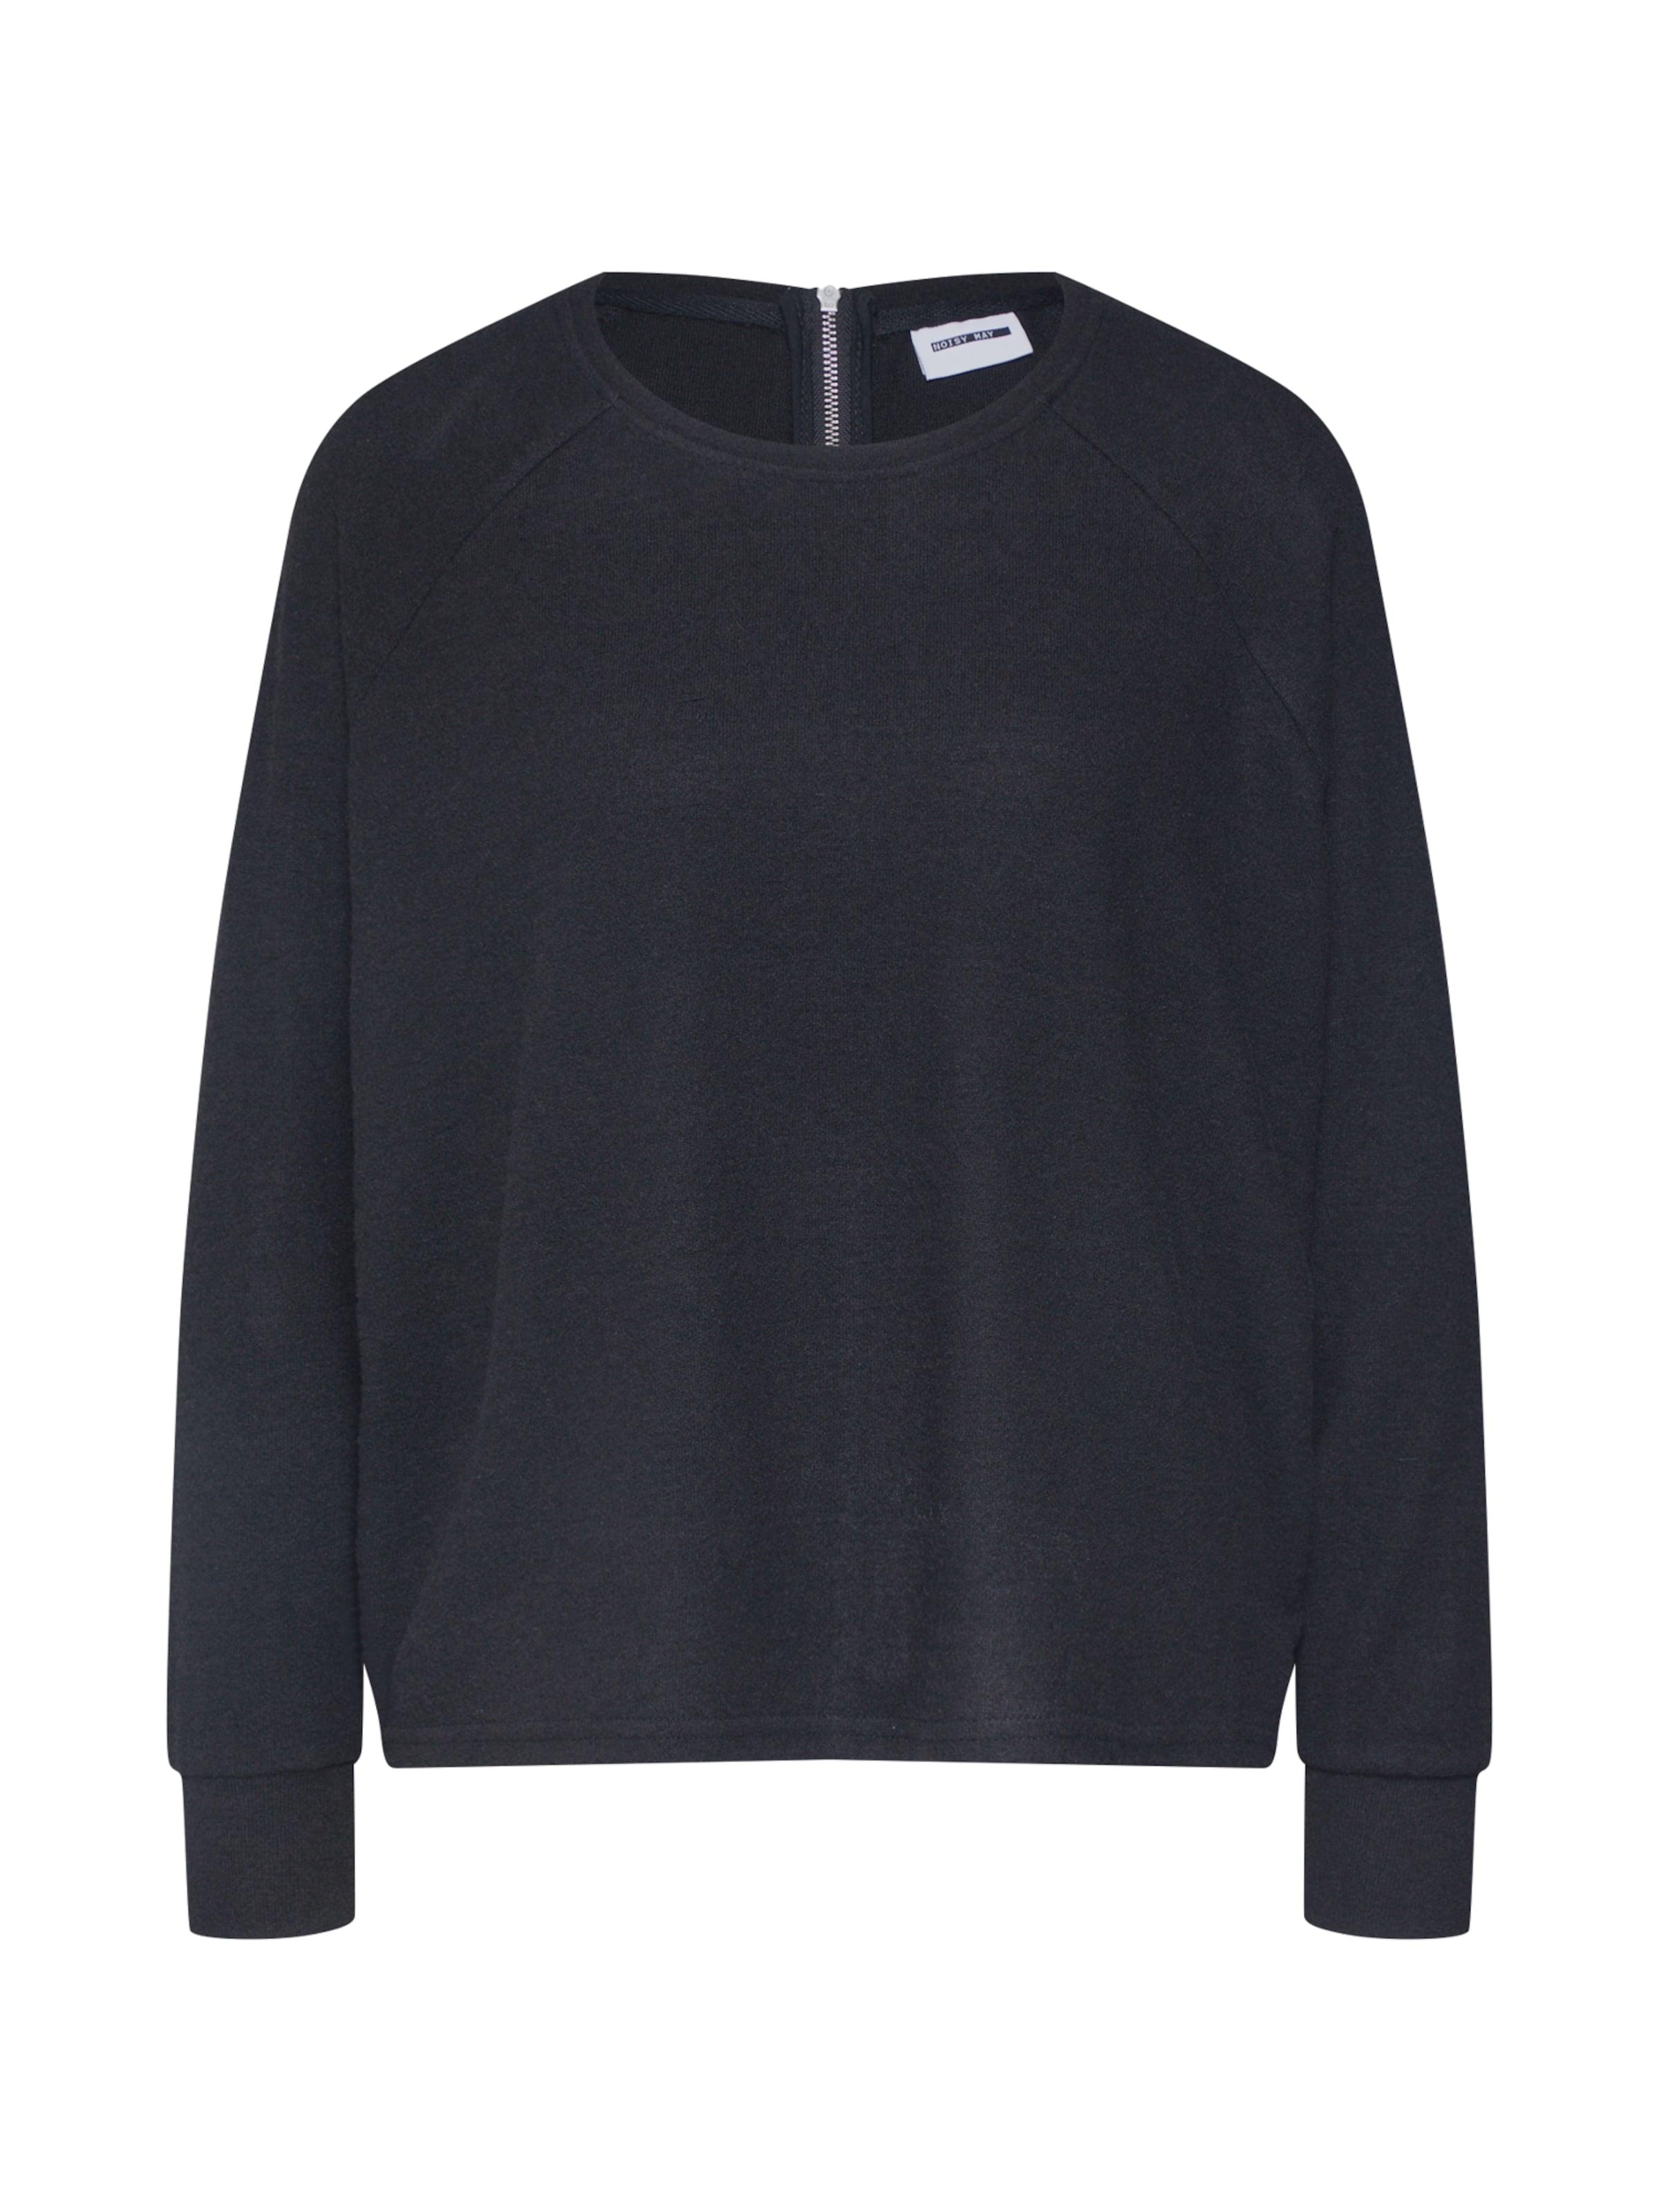 May En Noisy Zip Sweat Top' L s shirt 'nmcity Noir b6vYyIf7gm